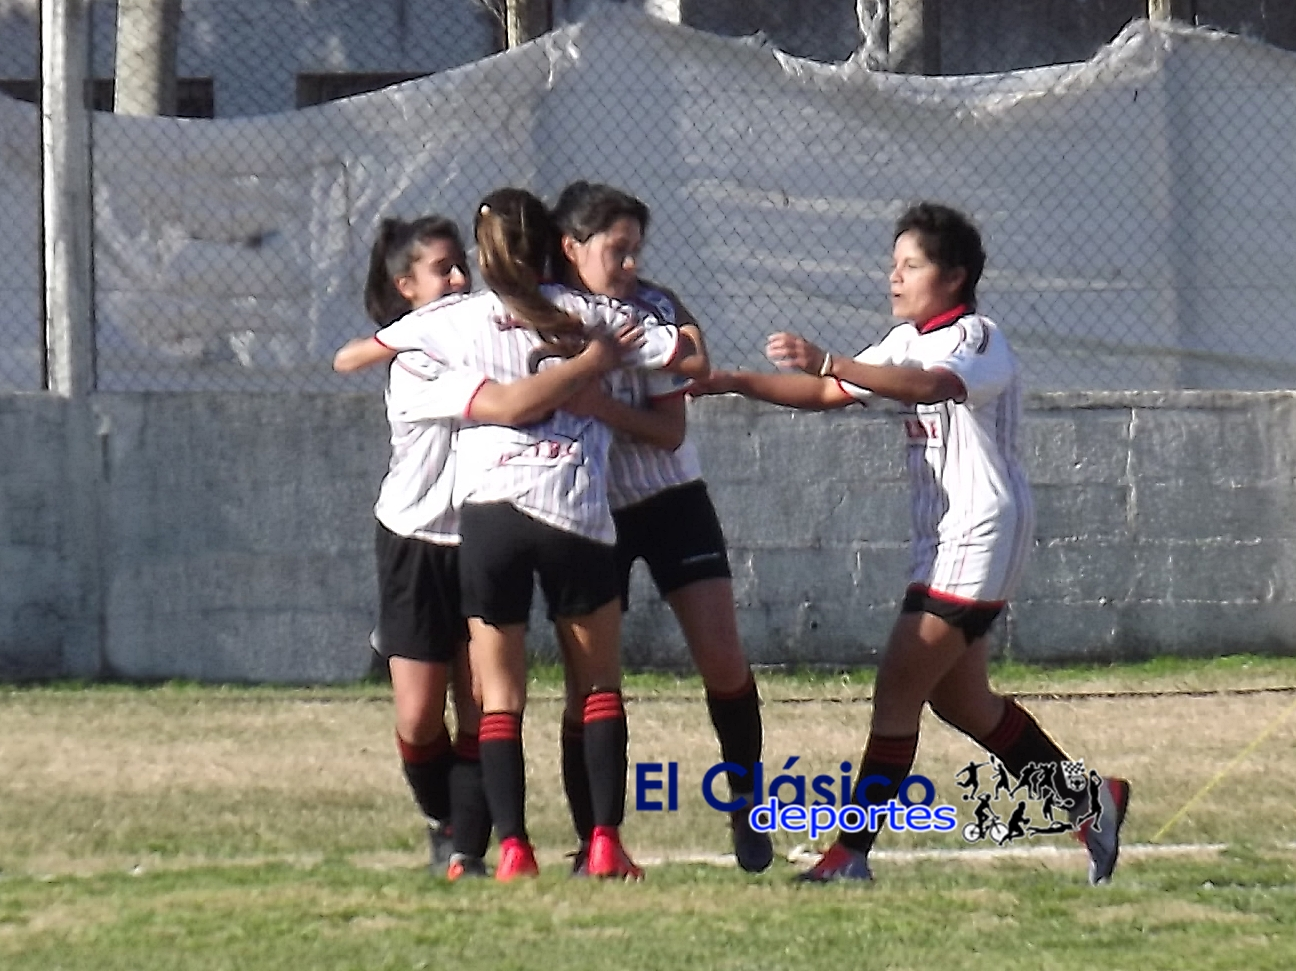 Nacional Femenino: San Nicolás-San Pedro va el sábado a las 19:30 horas